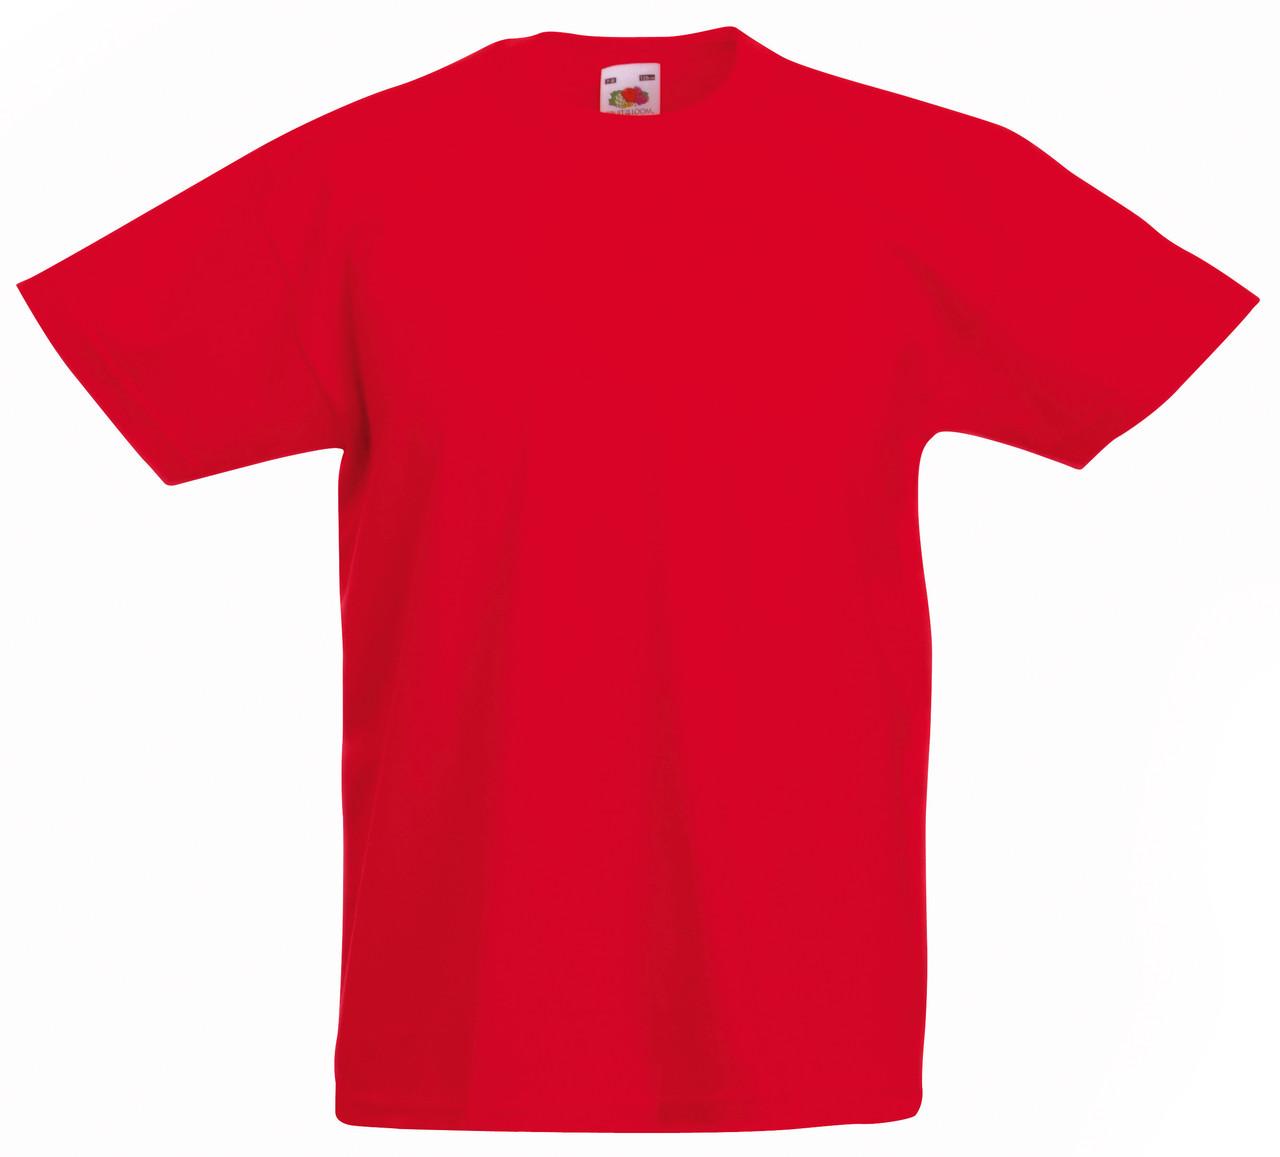 Детская Легкая Футболка Красная Fruit of the loom 61-019-40 12-13